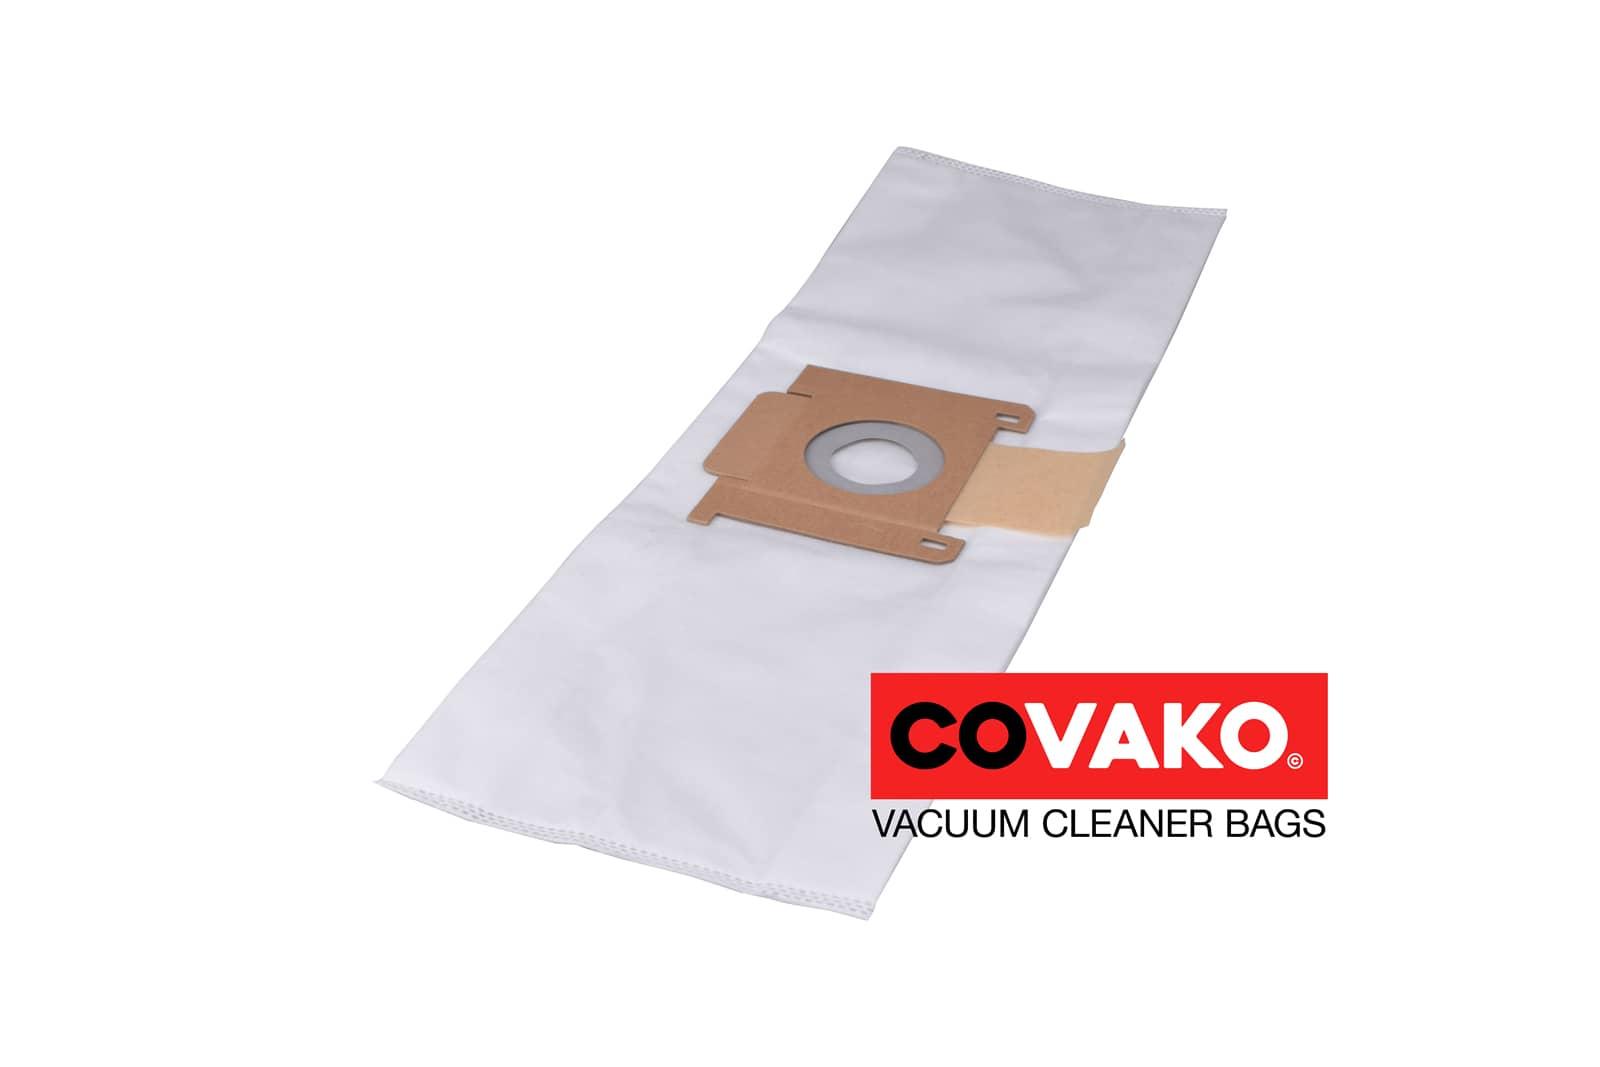 I-vac pur Q / Synthesis - I-vac vacuum cleaner bags